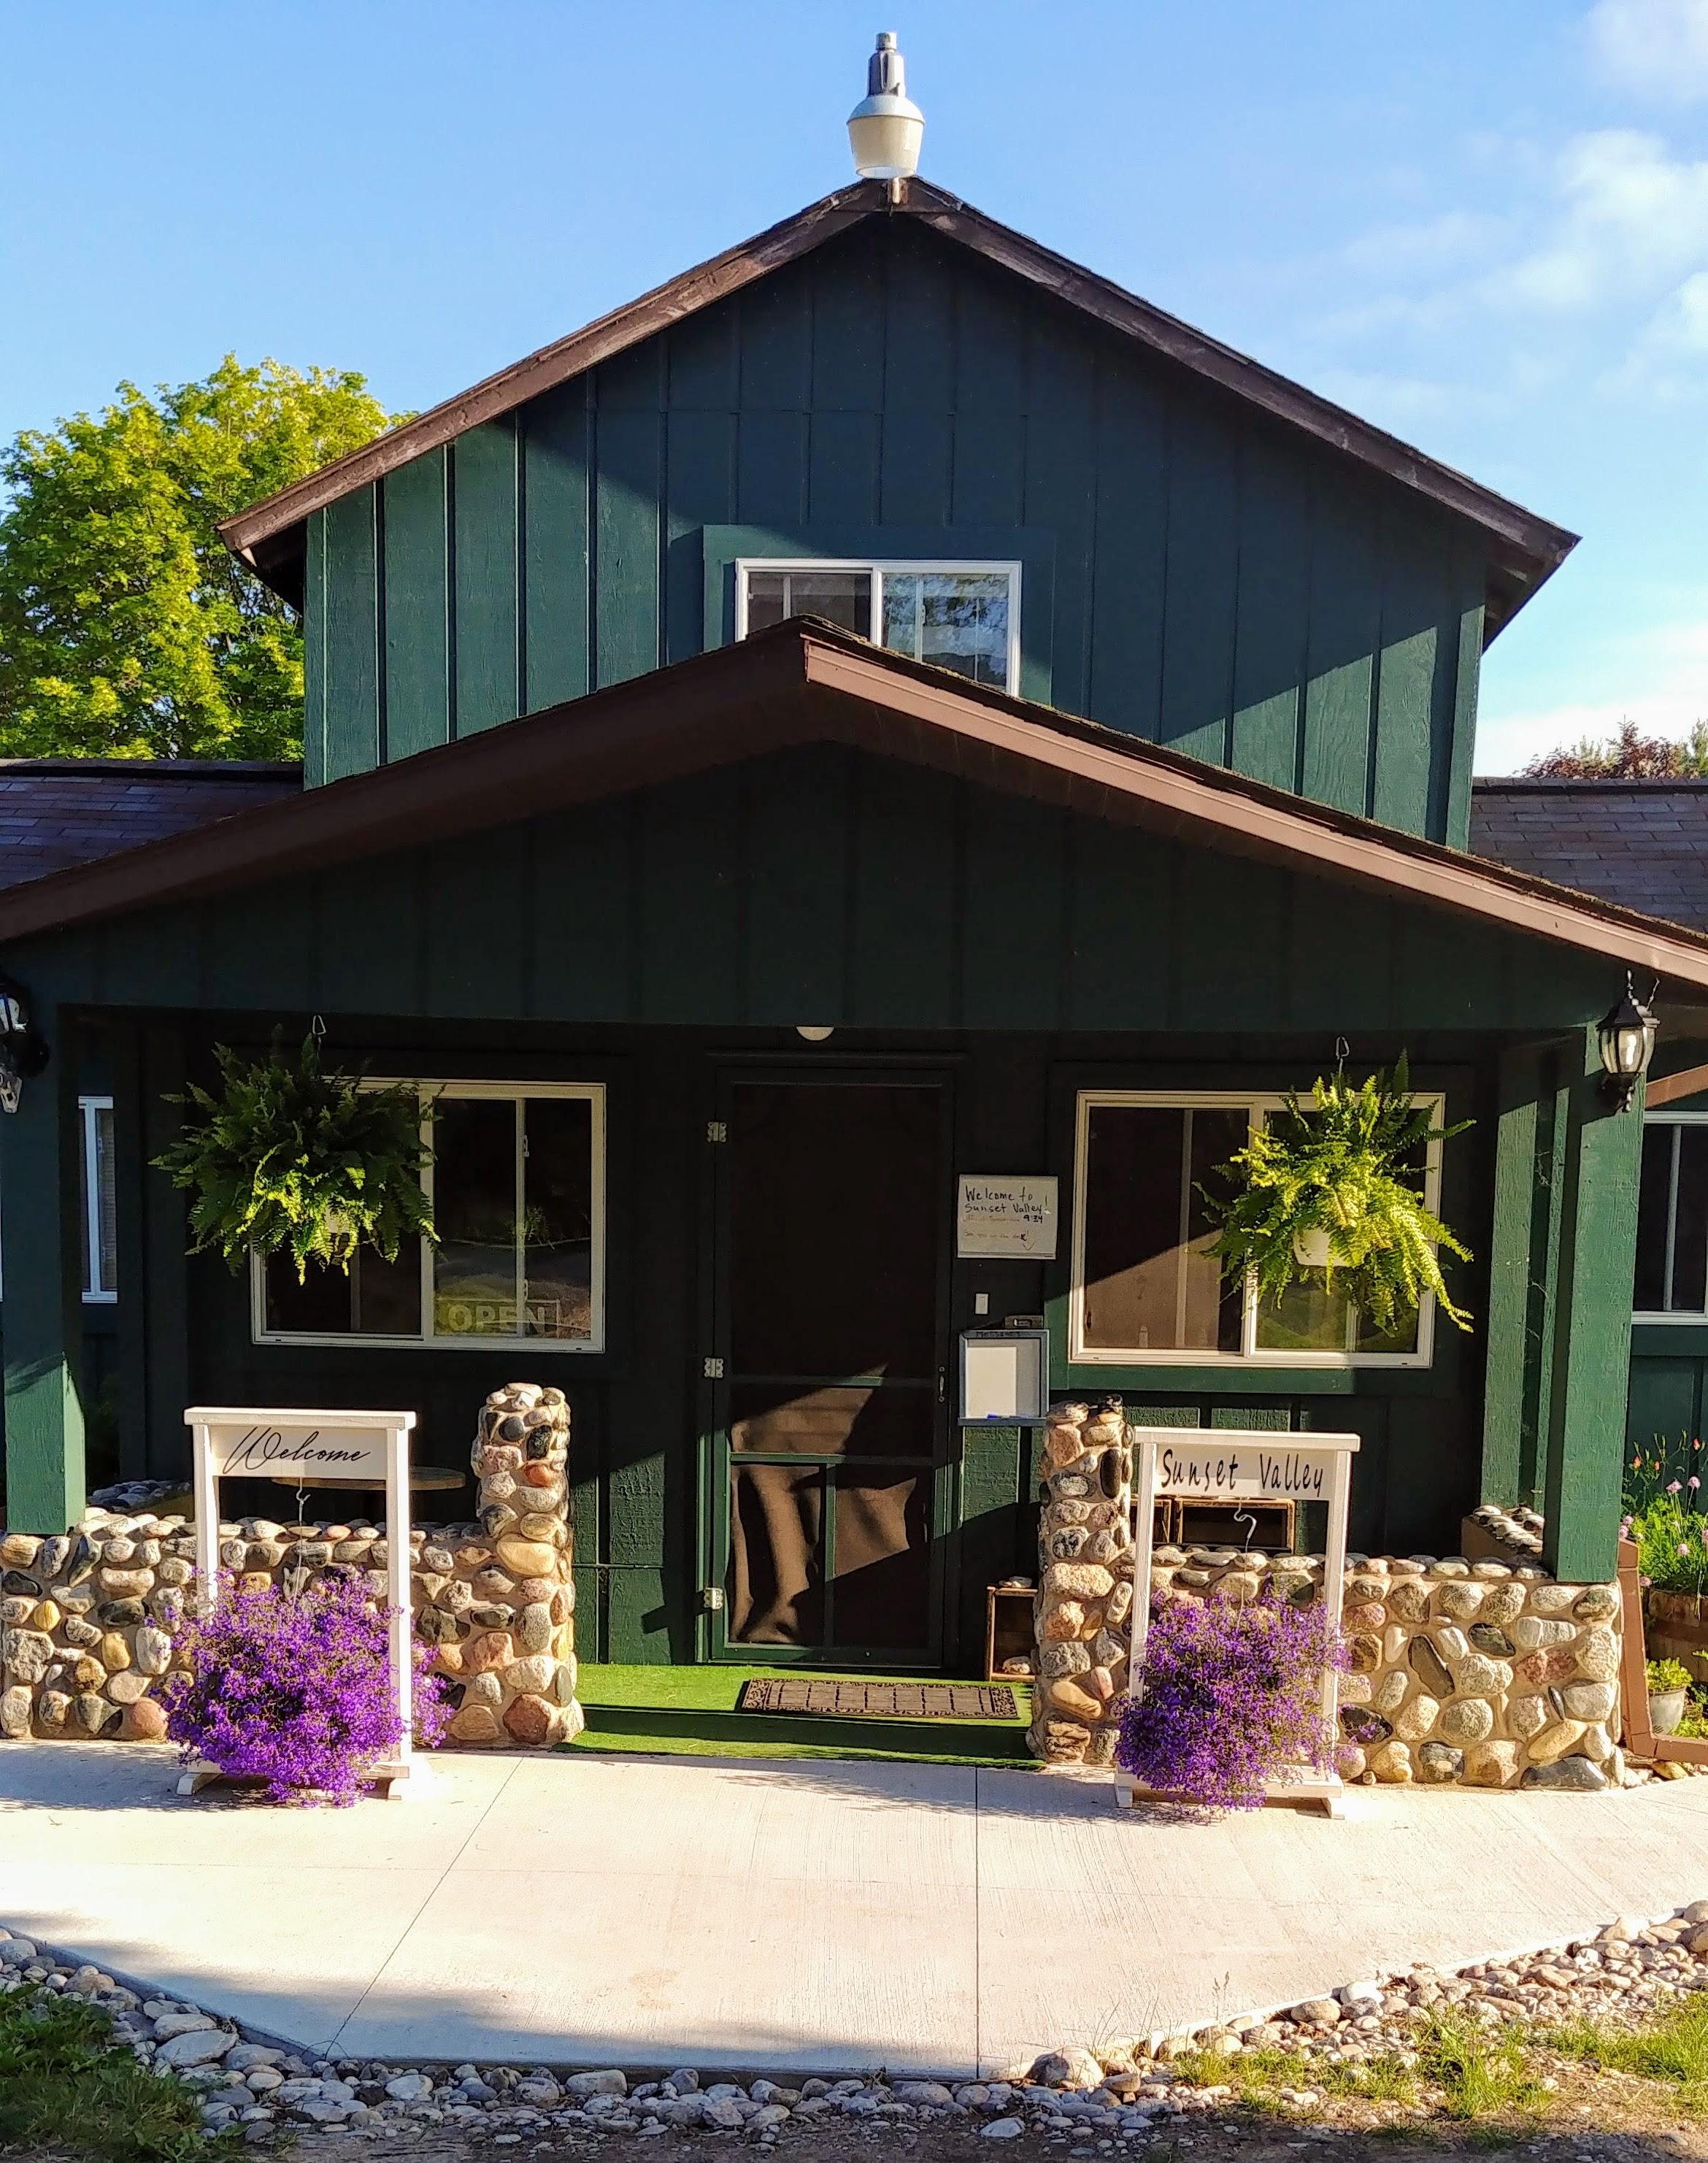 Sunset Valley Resort Arcadia Michigan Welcome